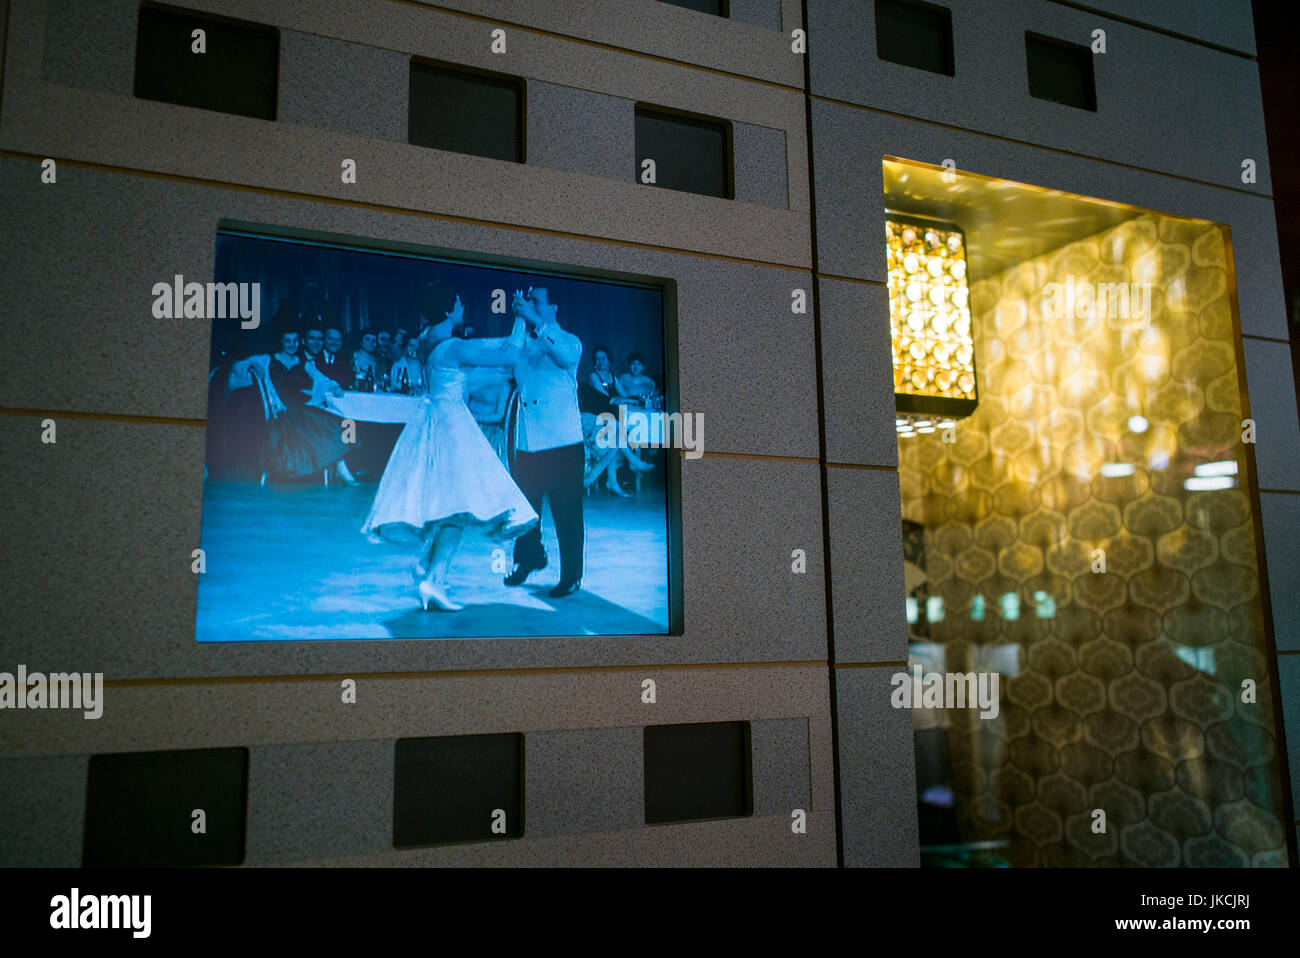 Germany, Berlin, Museum Insel, DDR Museum, museum of life in East German under Communist rule, video of ballroom - Stock Image